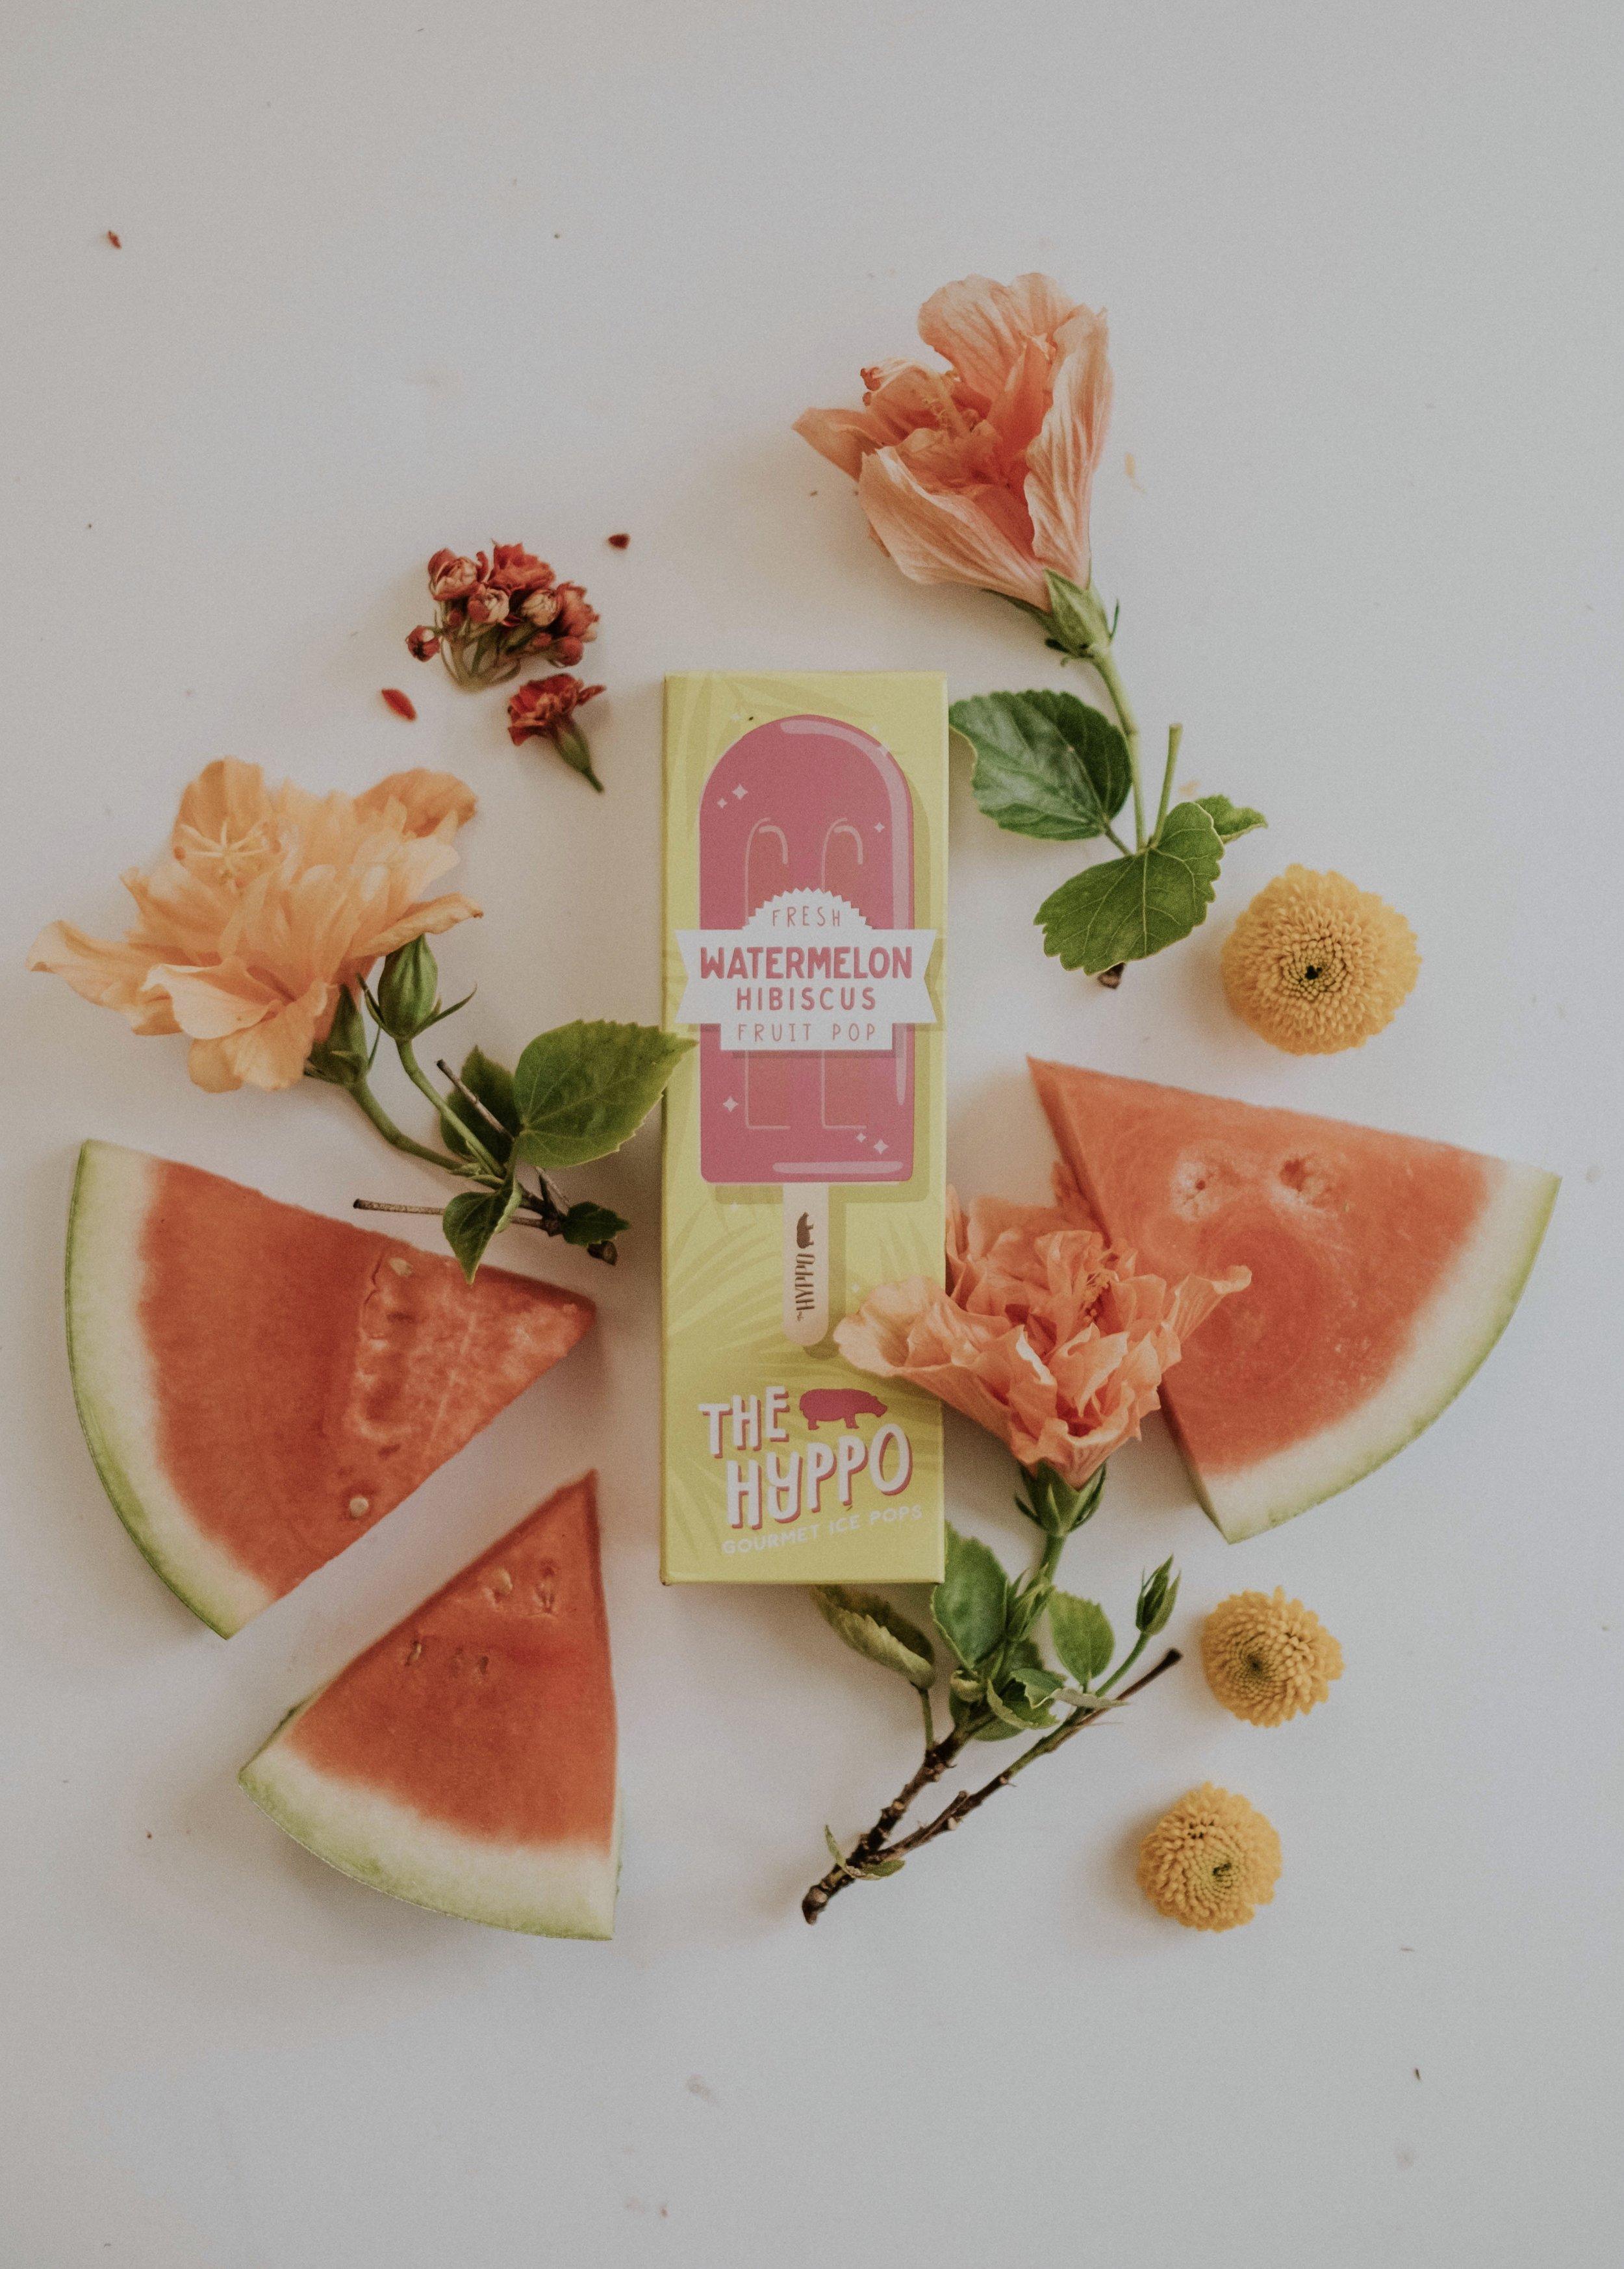 Watermelon Hibiscus Fruit Pop: a super refreshing summertime pop